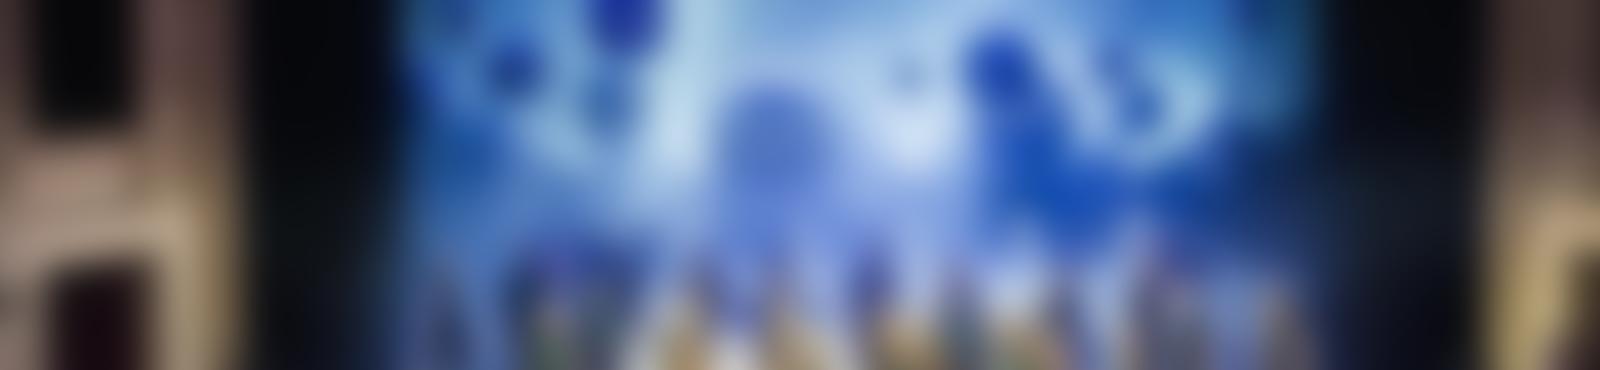 Blurred 131c5b47 44a6 4a2f bfd9 018ab80bc105